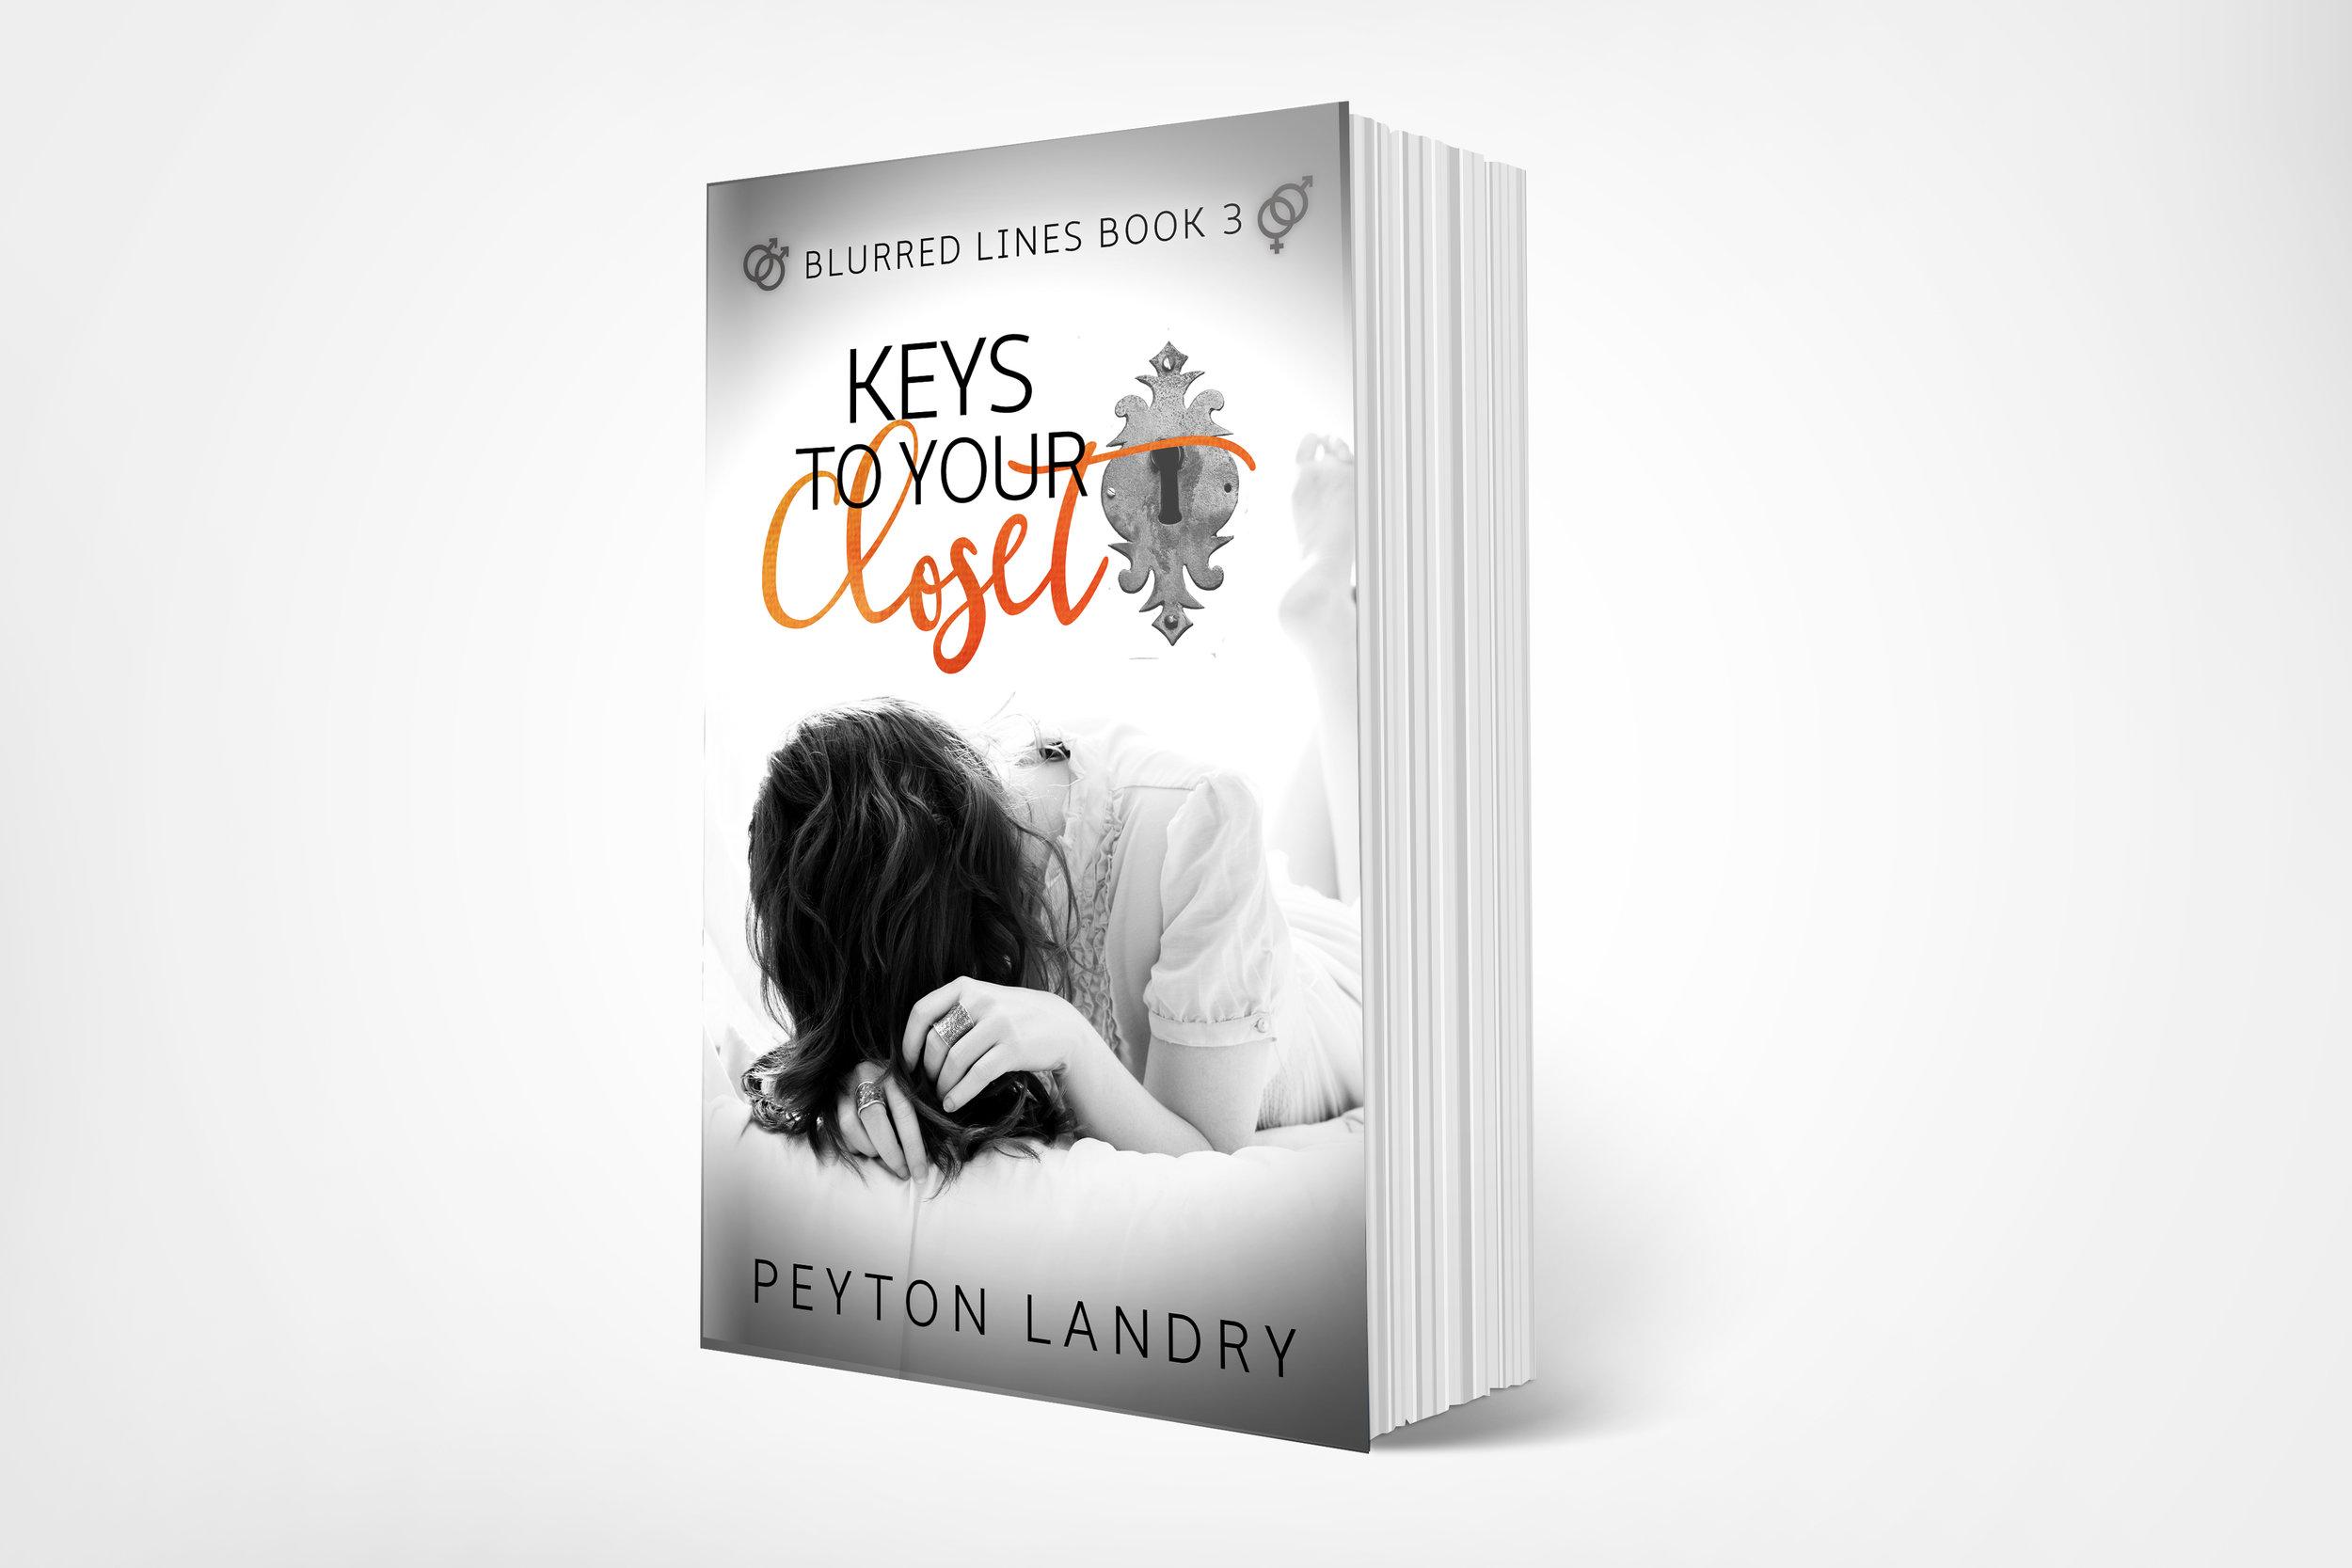 Keys To Your Closet Book Cover